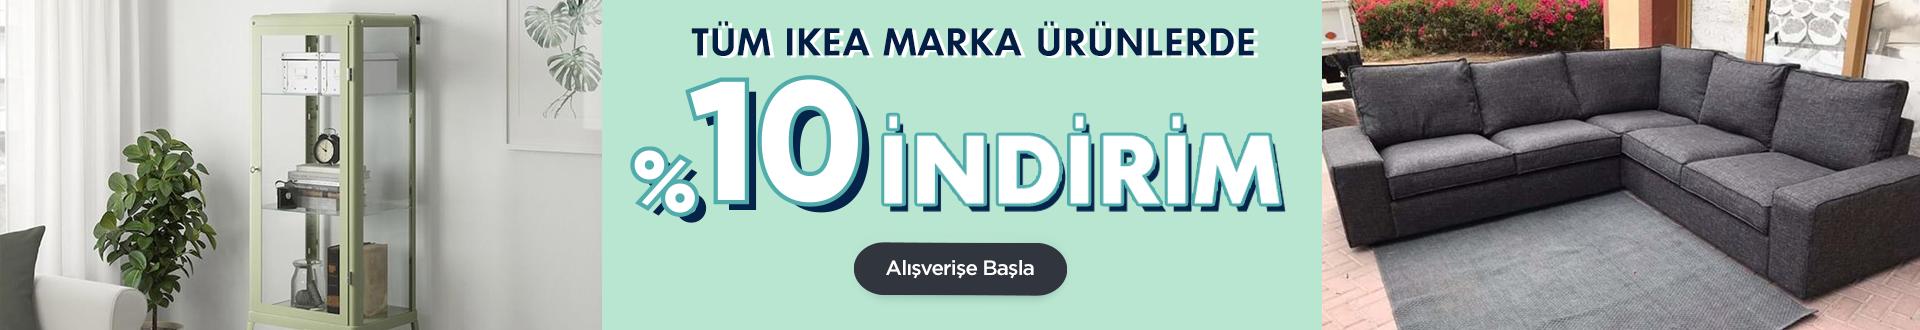 IKEA %10 İndirim